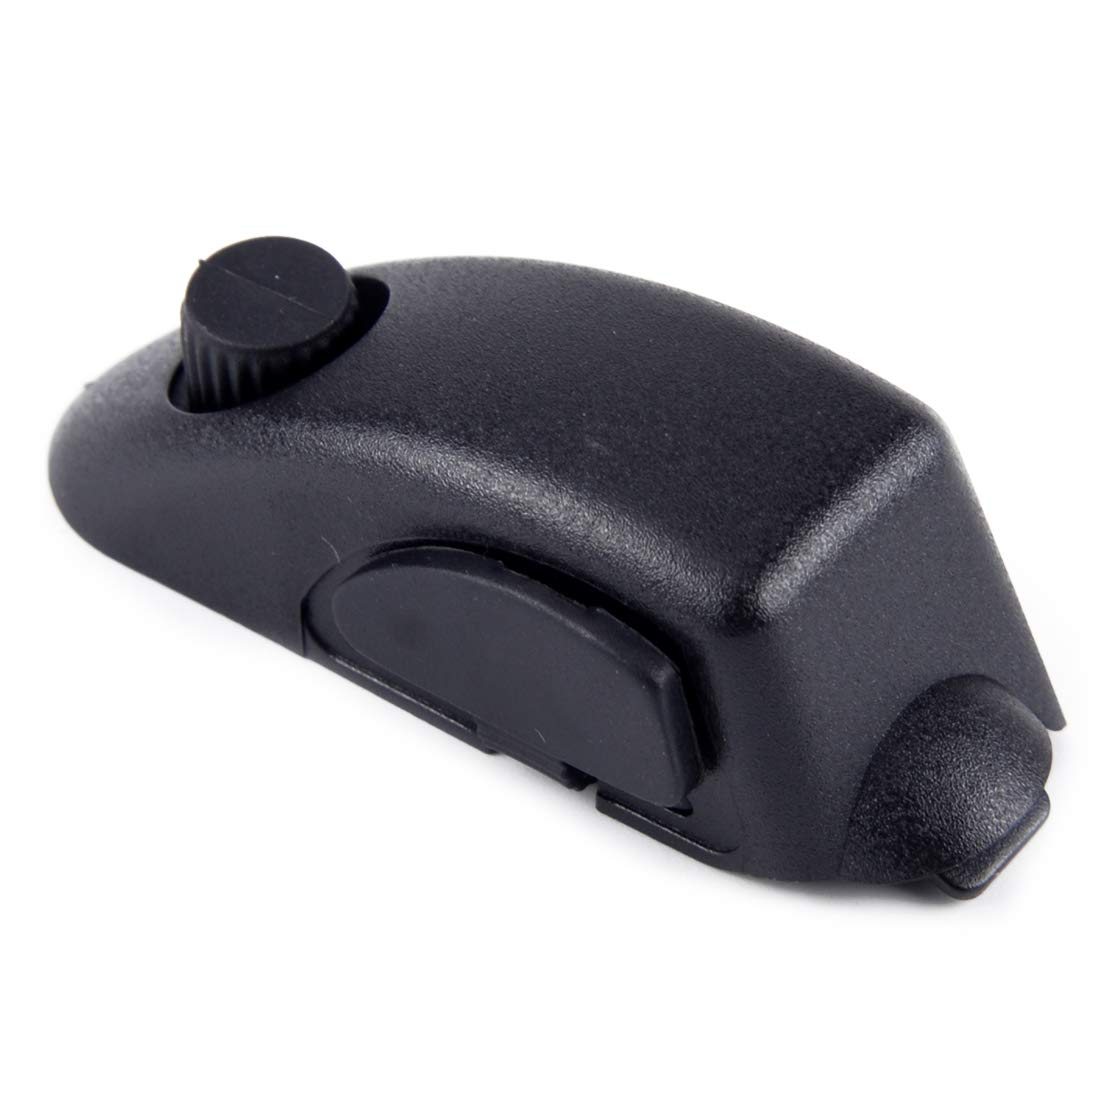 Motorola Audio Earpiece Adaptor for Radio GP328 GP340 HT1250 GP760 2 PIN